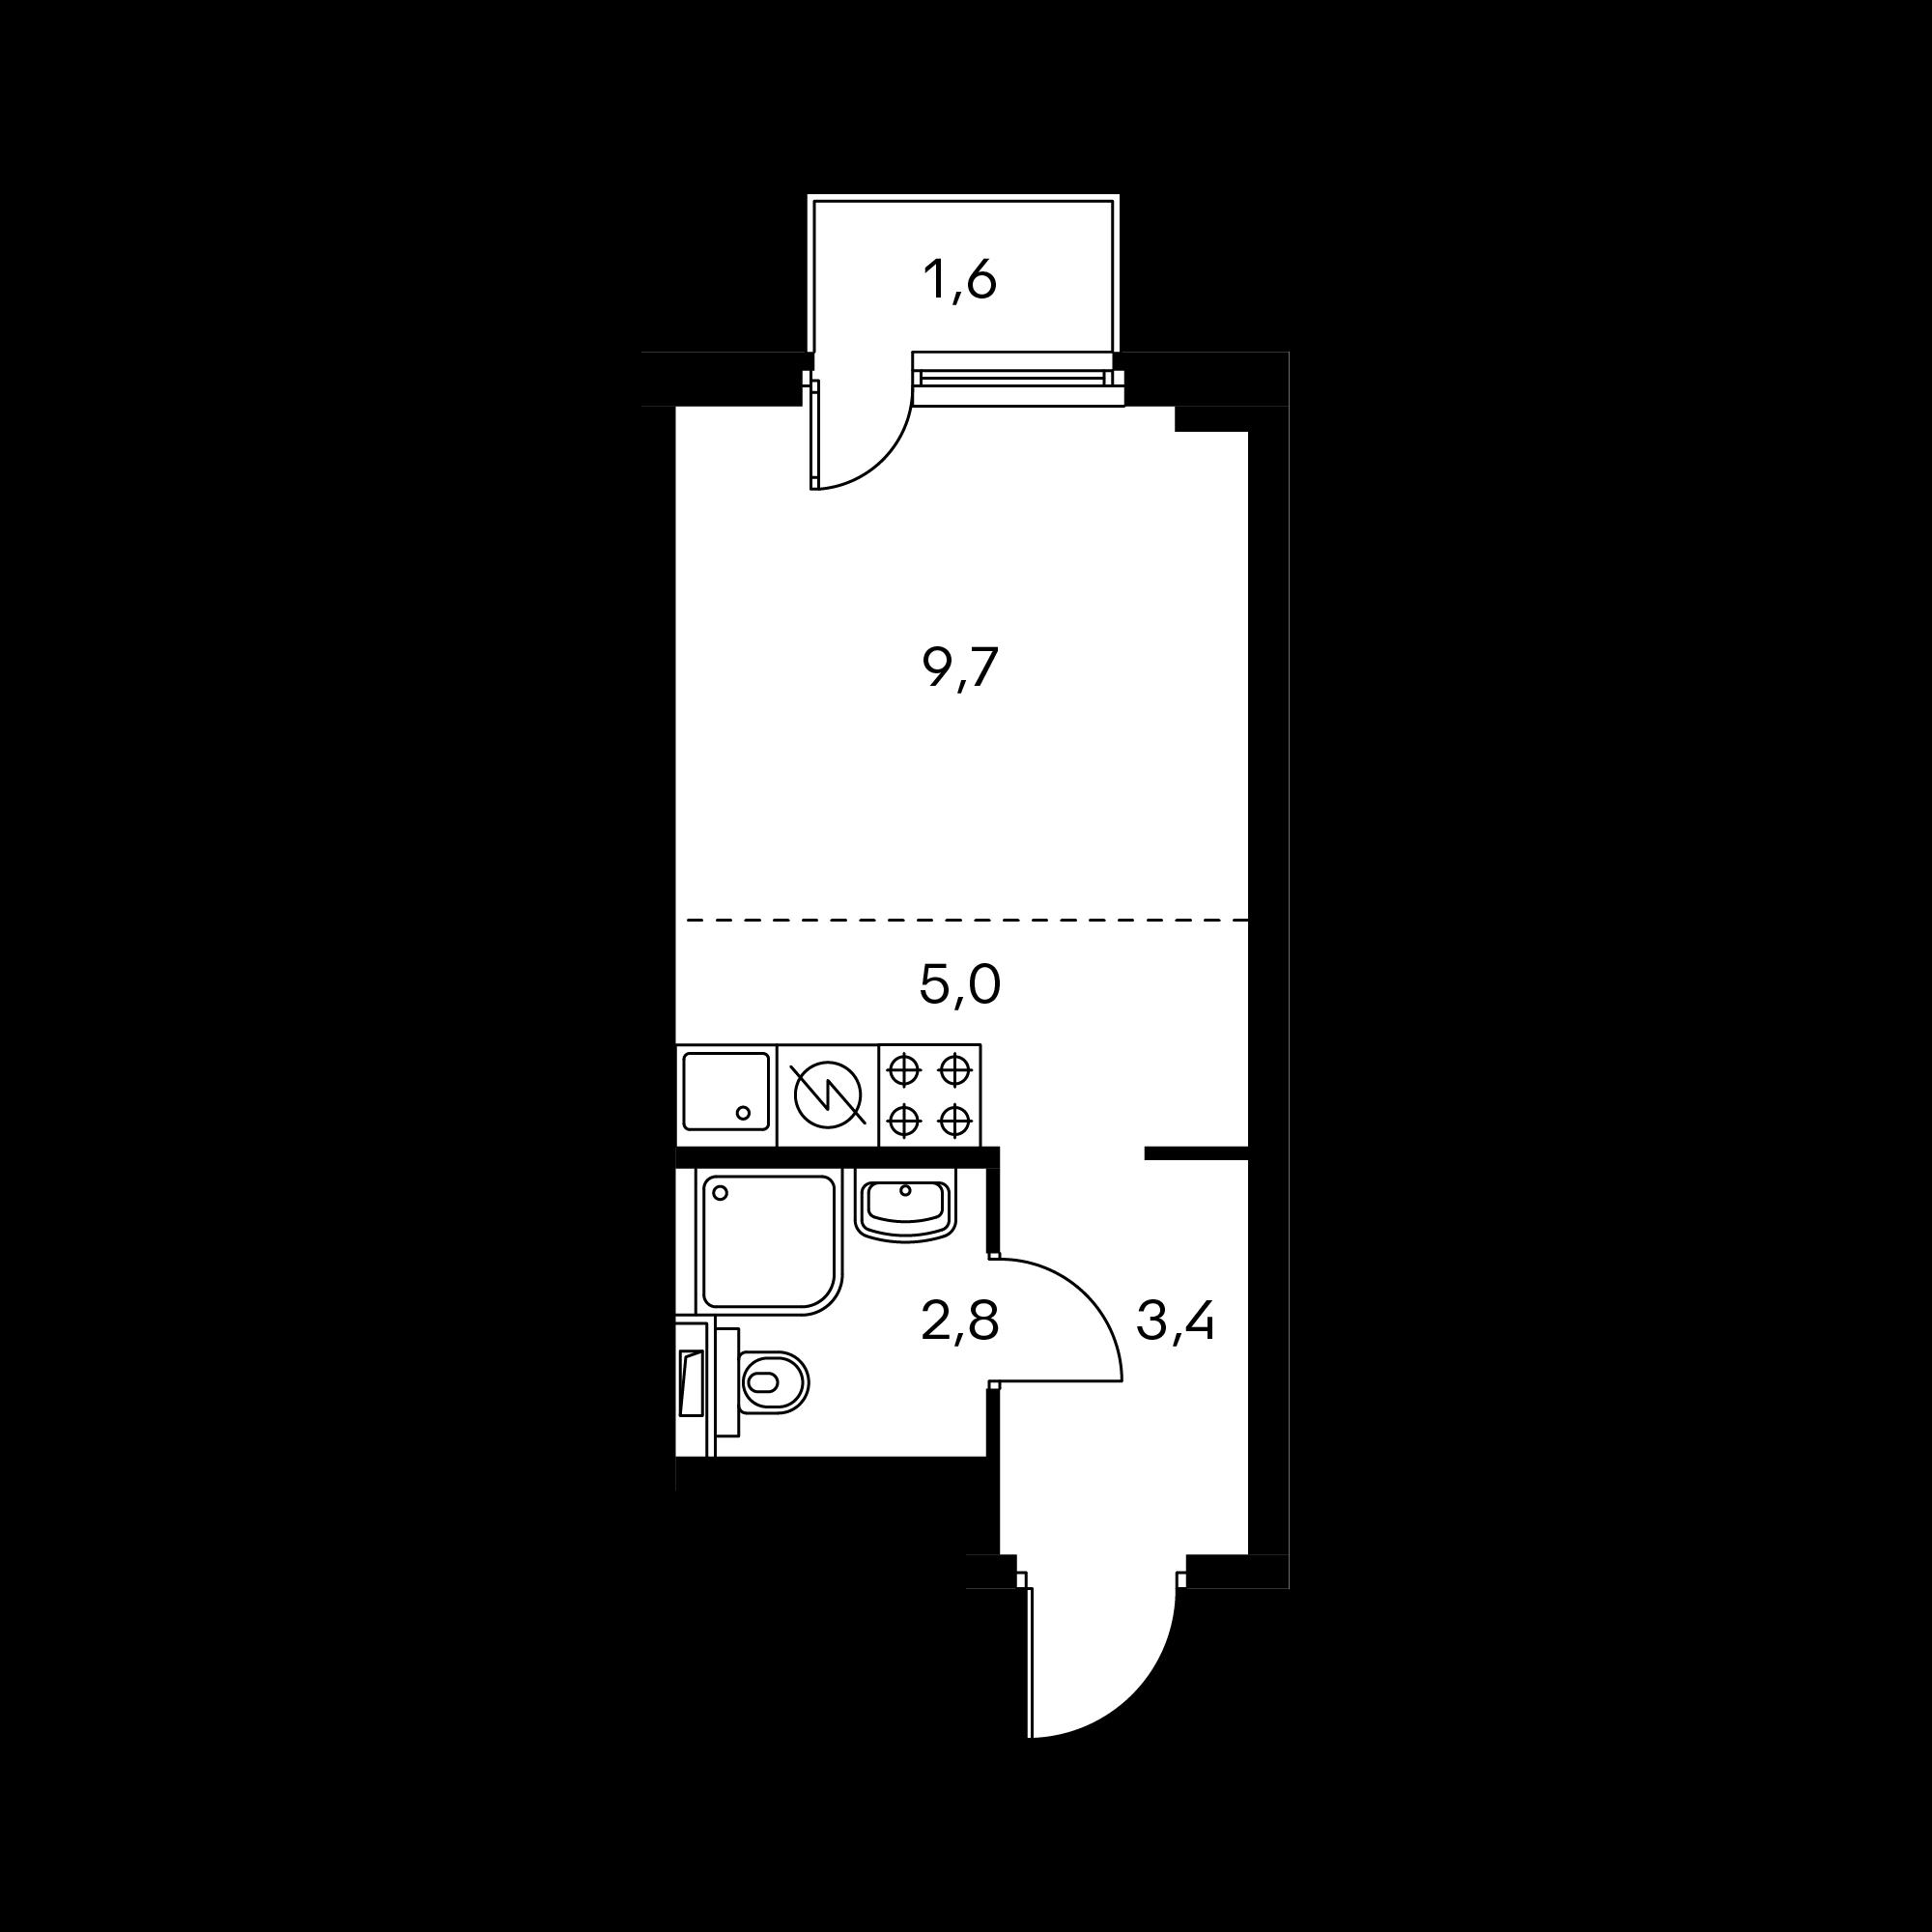 1NS1_3.6-1SZB*